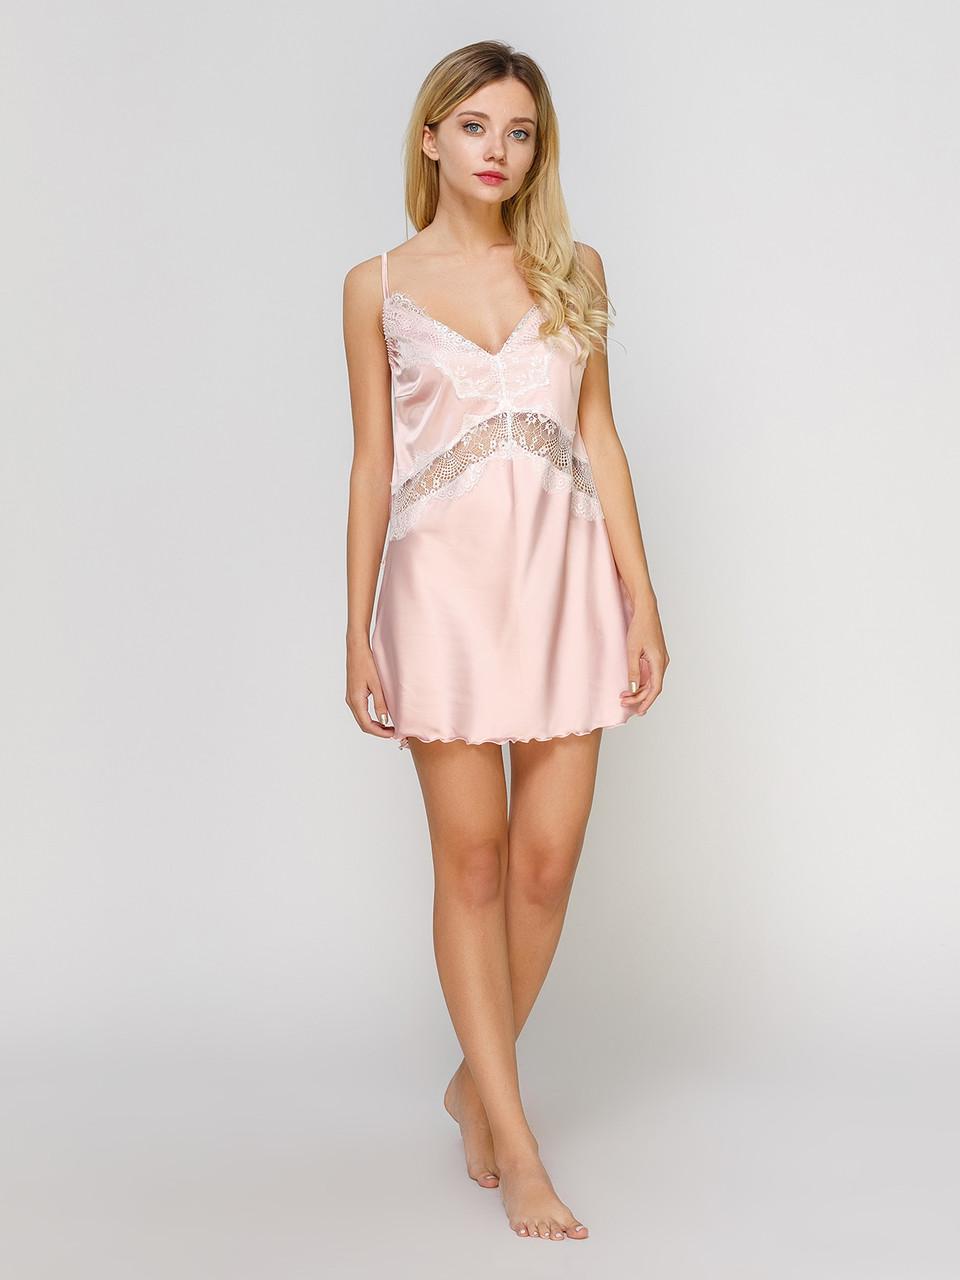 Сорочка Serenade сатин-шовк пудра c мереживом